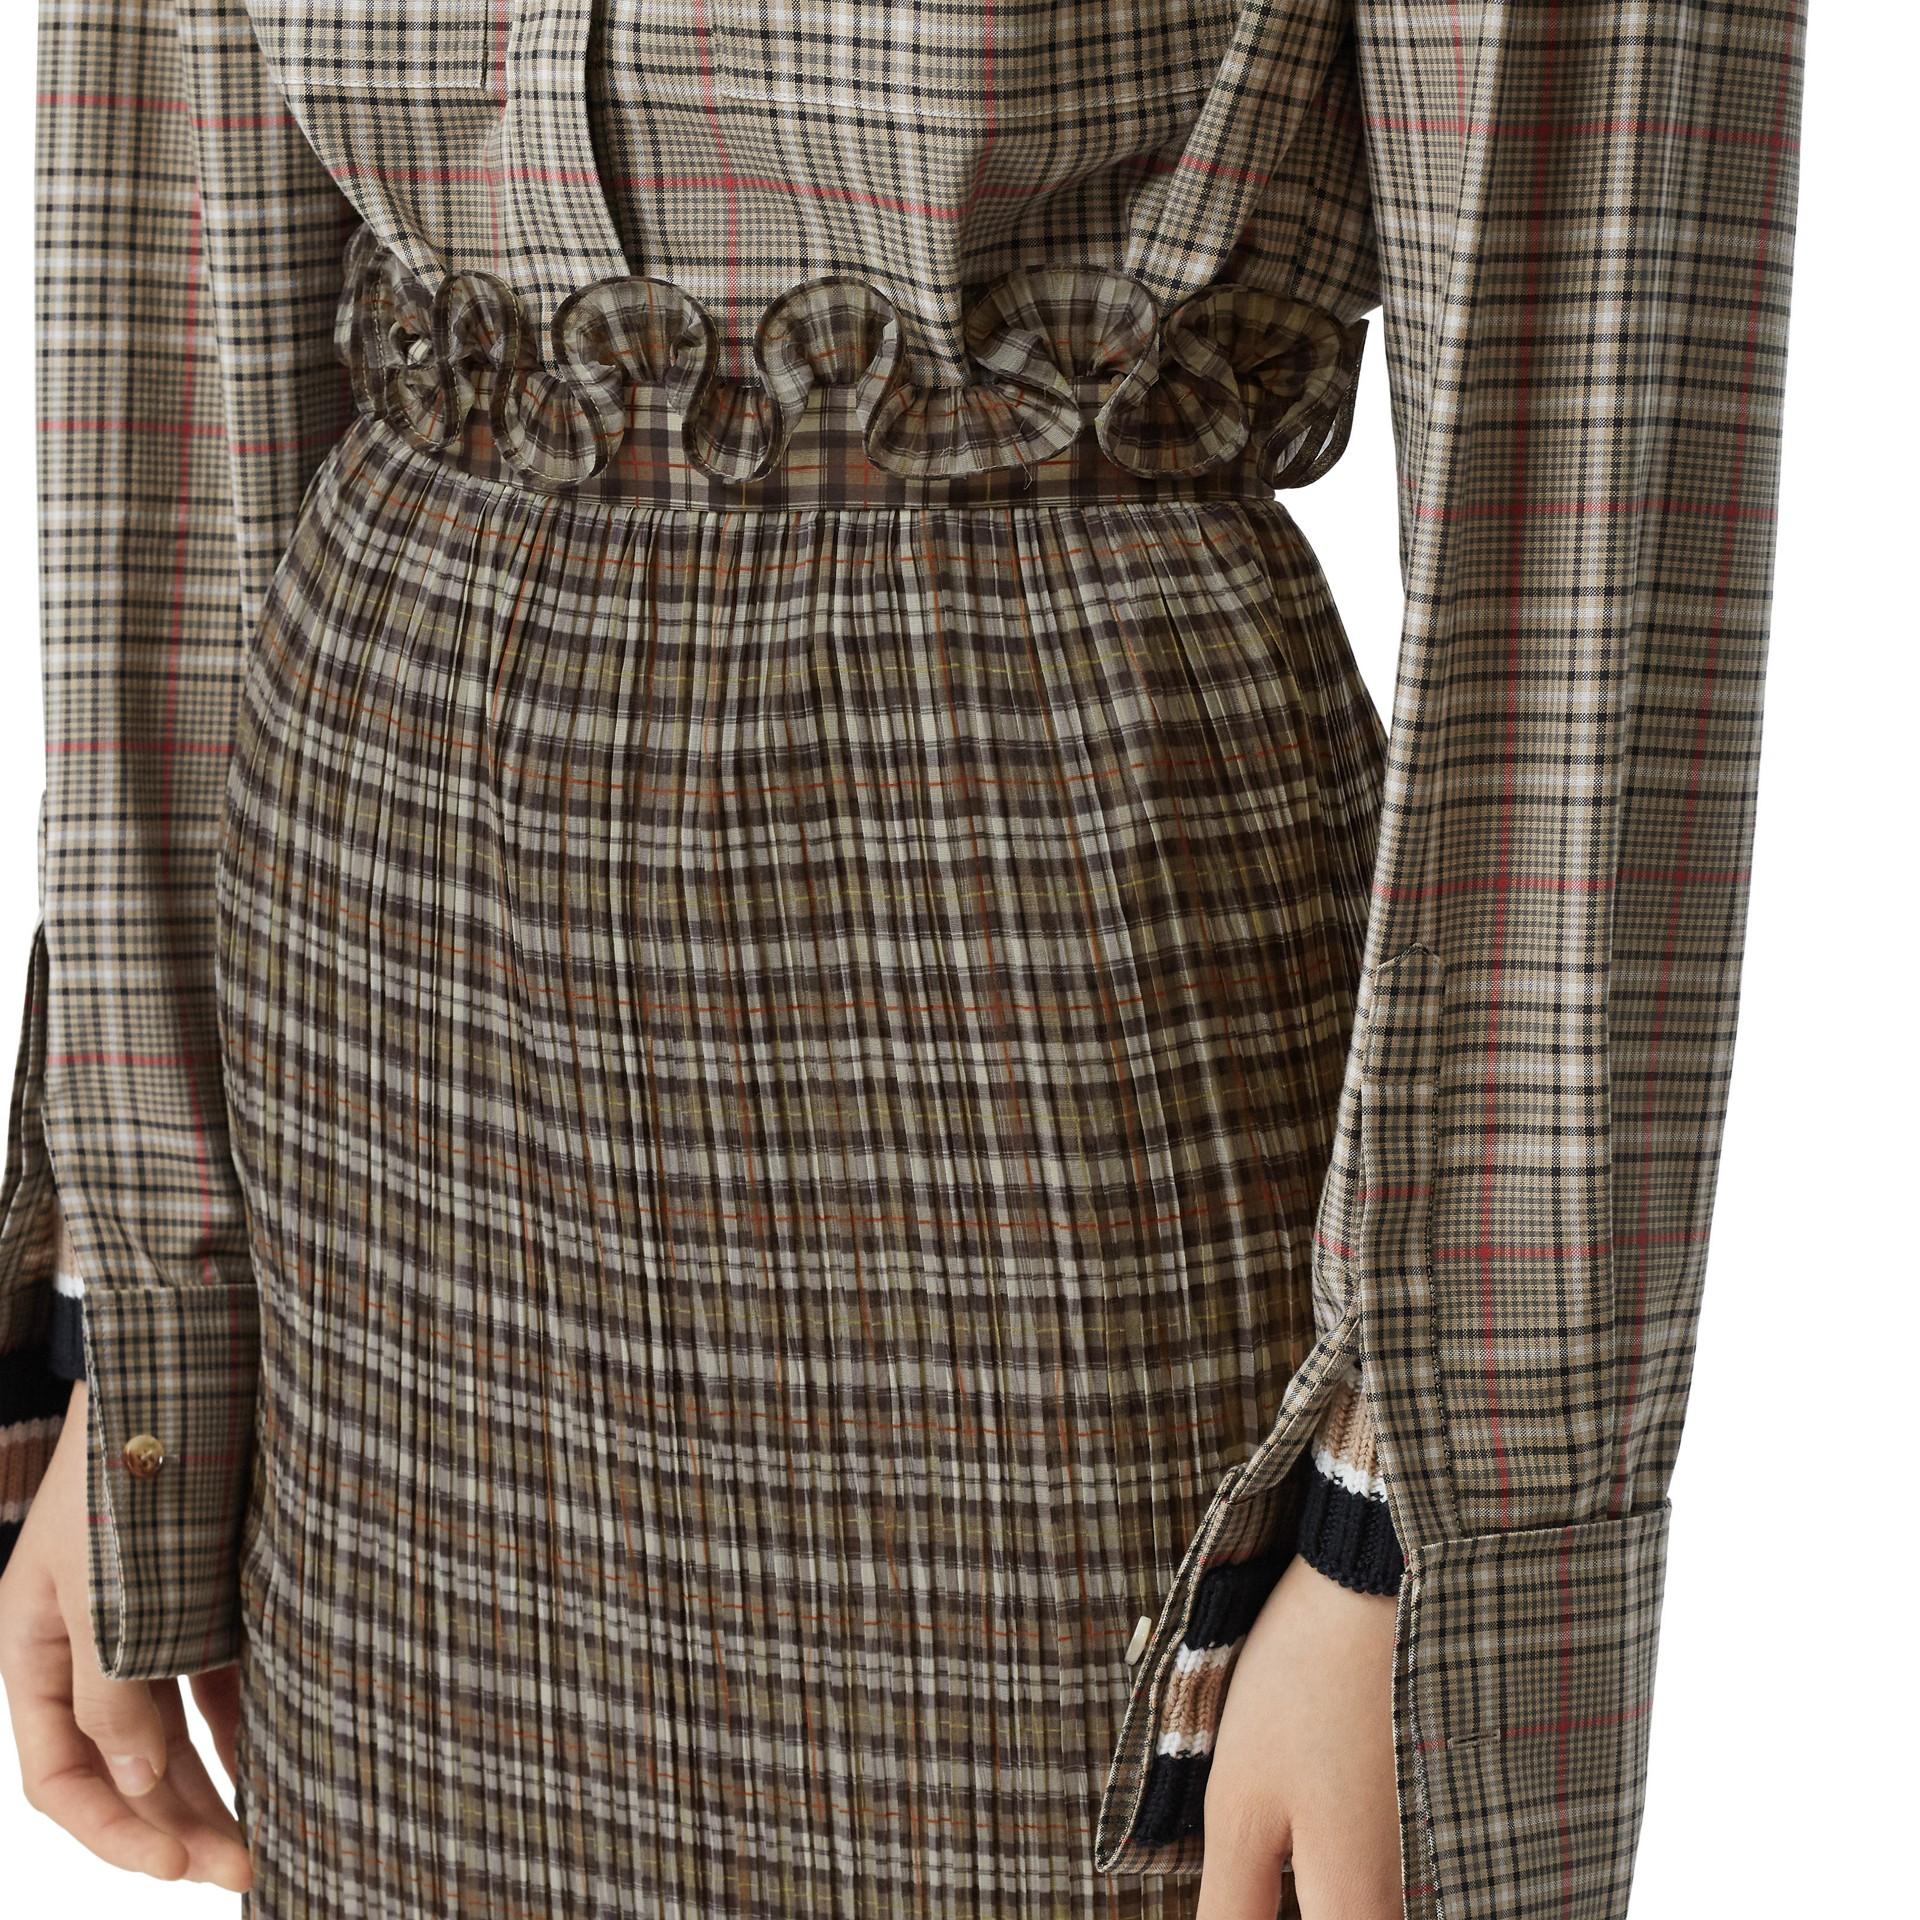 Custom Fit Ruffle Detail Check Chiffon Plissé Skirt in Mahogany - Women | Burberry - gallery image 5